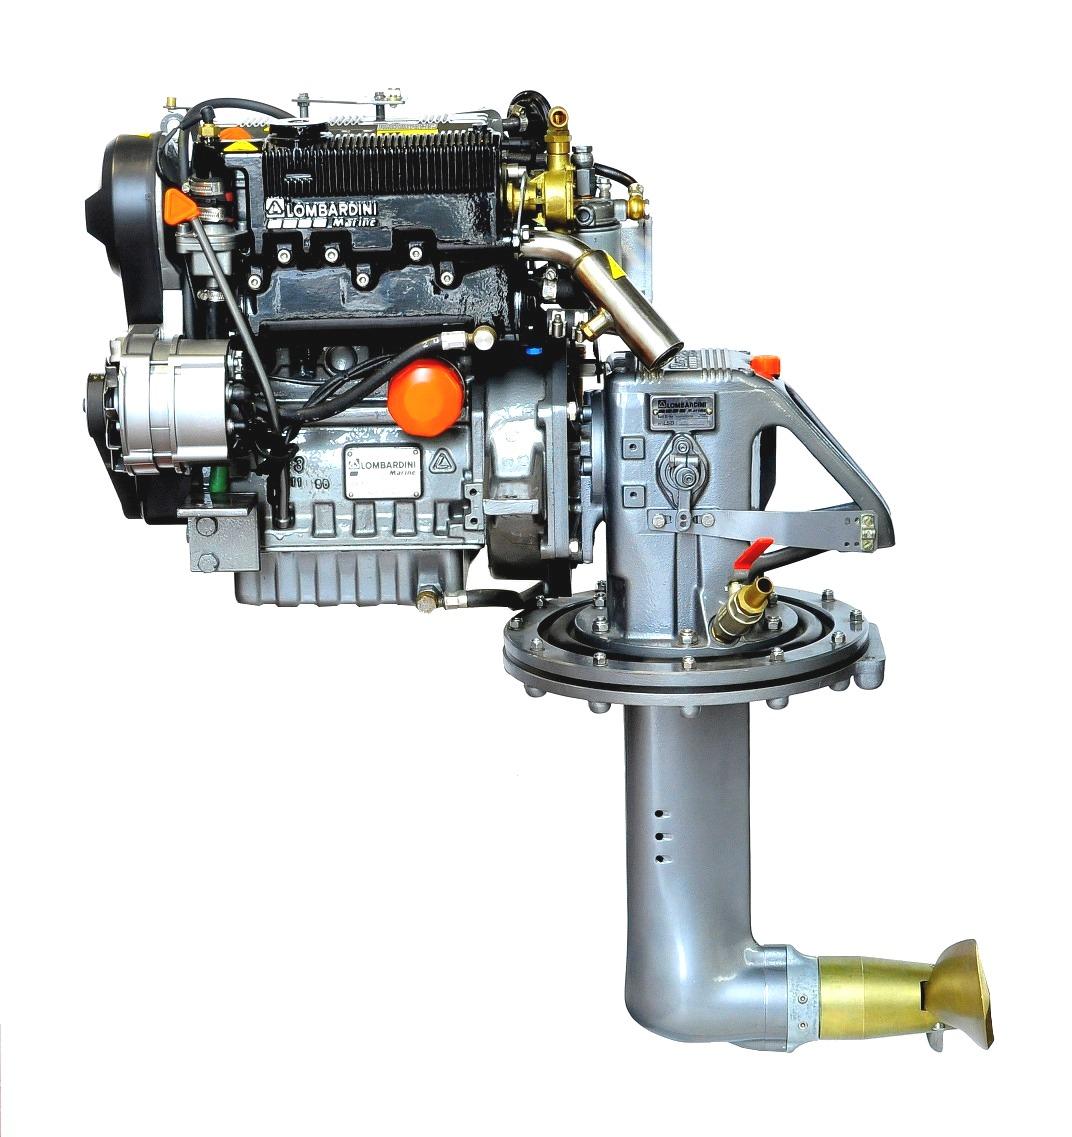 Lombardini LDW1003M, 27 hk dieselmotor med S-drev